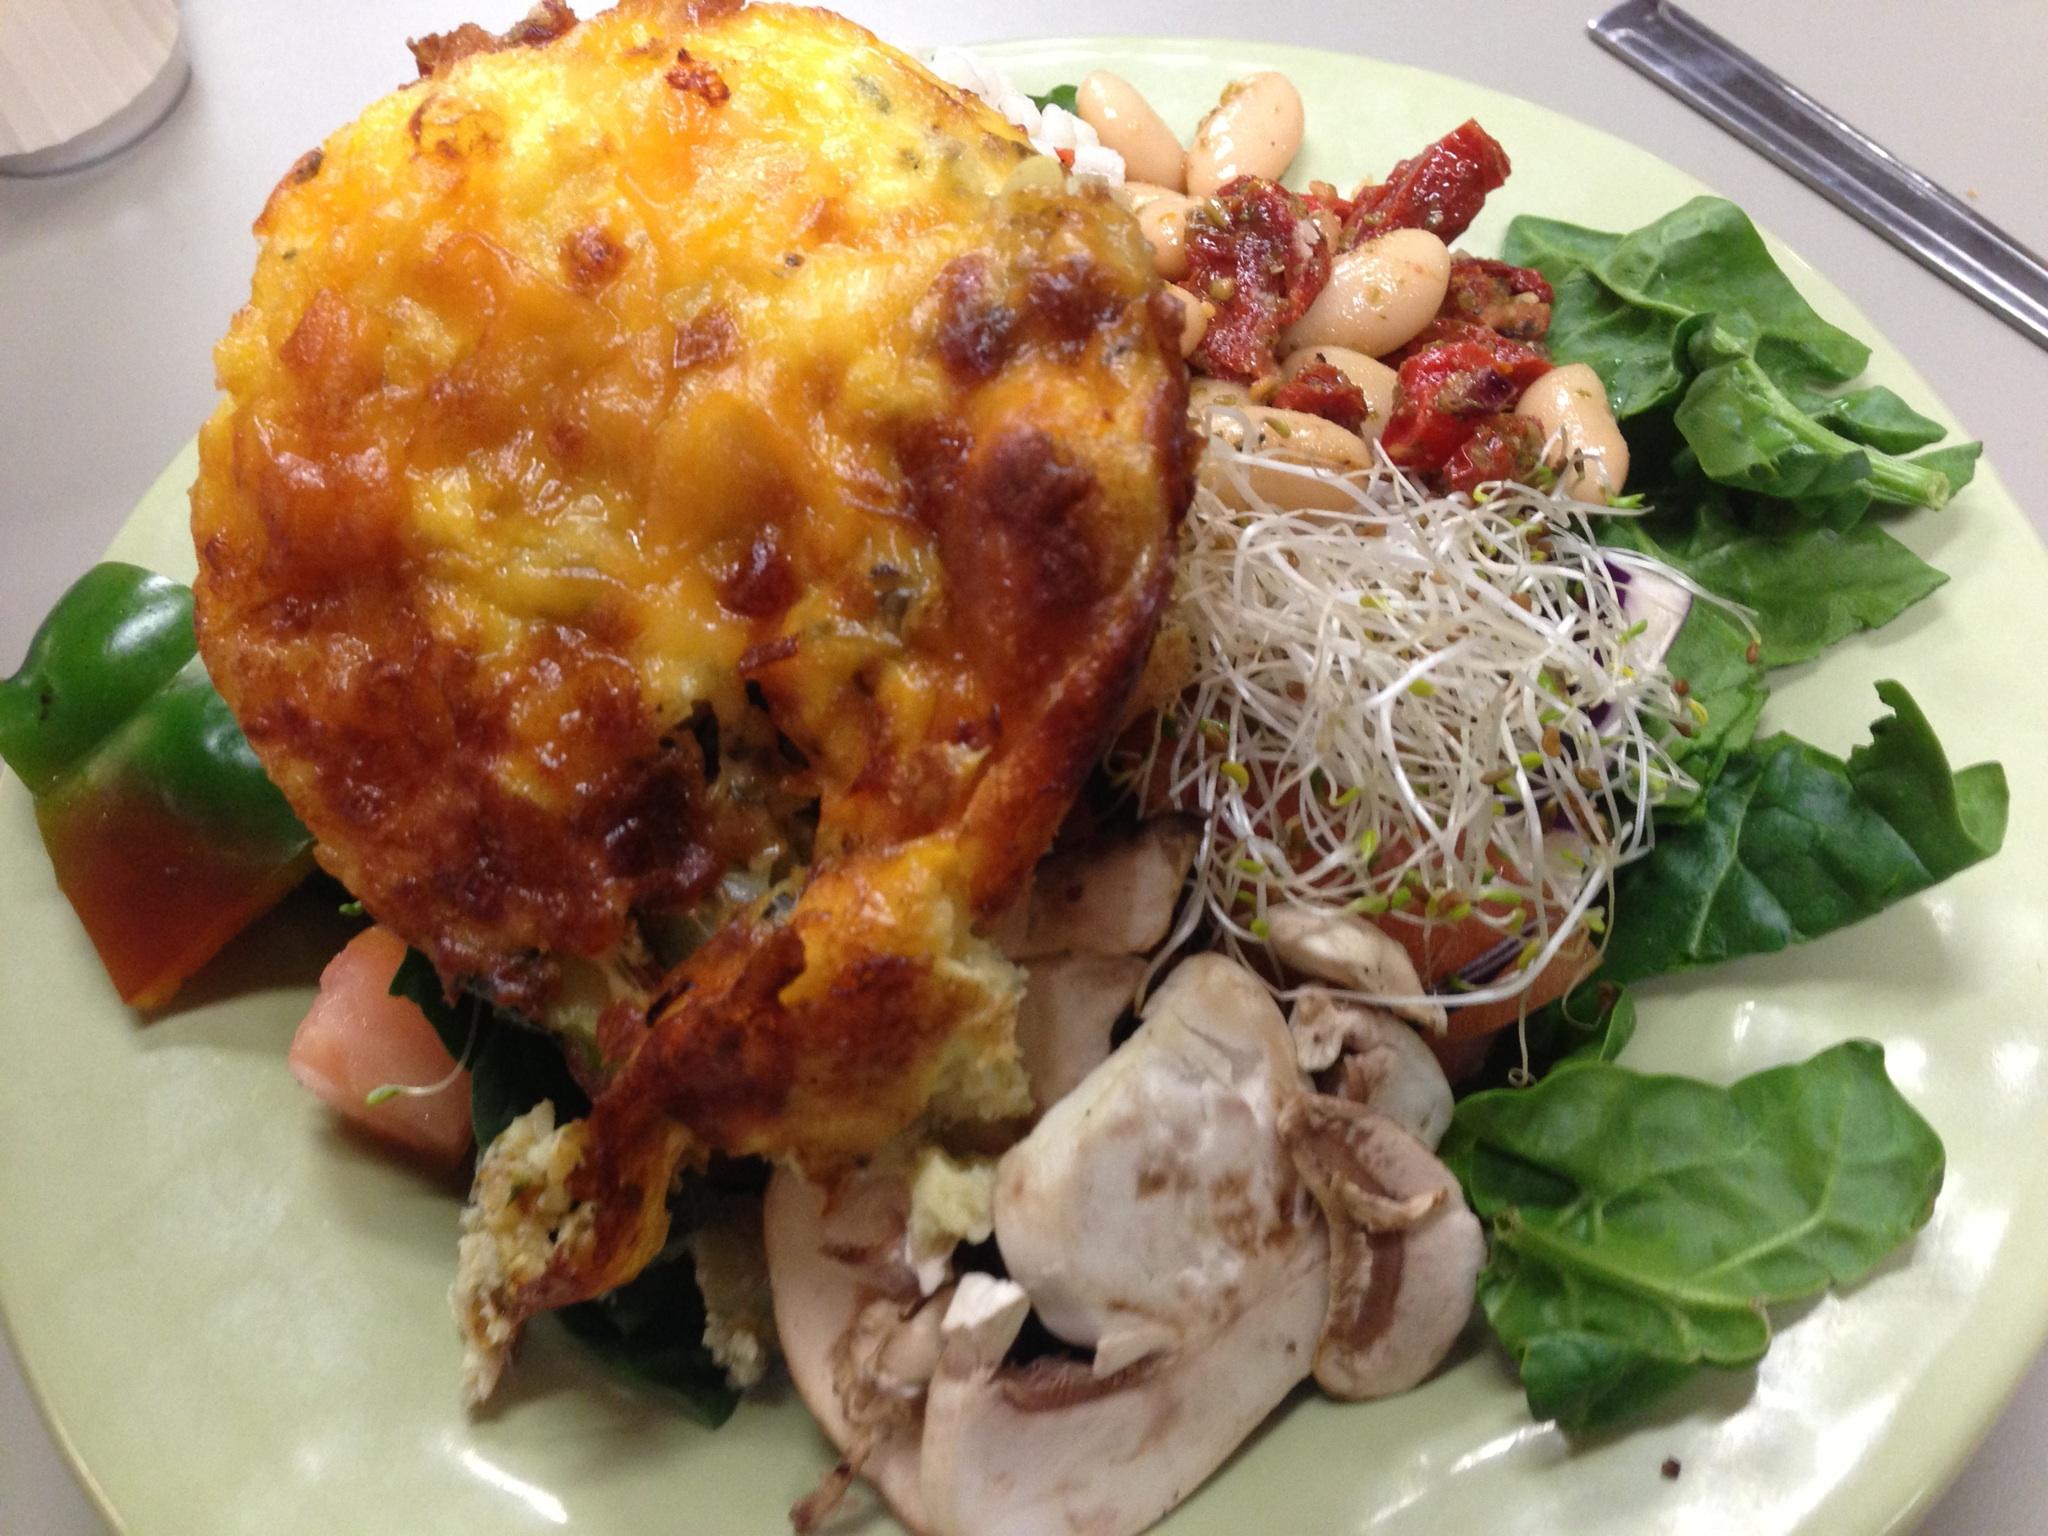 Salad + Egg, zucchini, mushroom and cheese